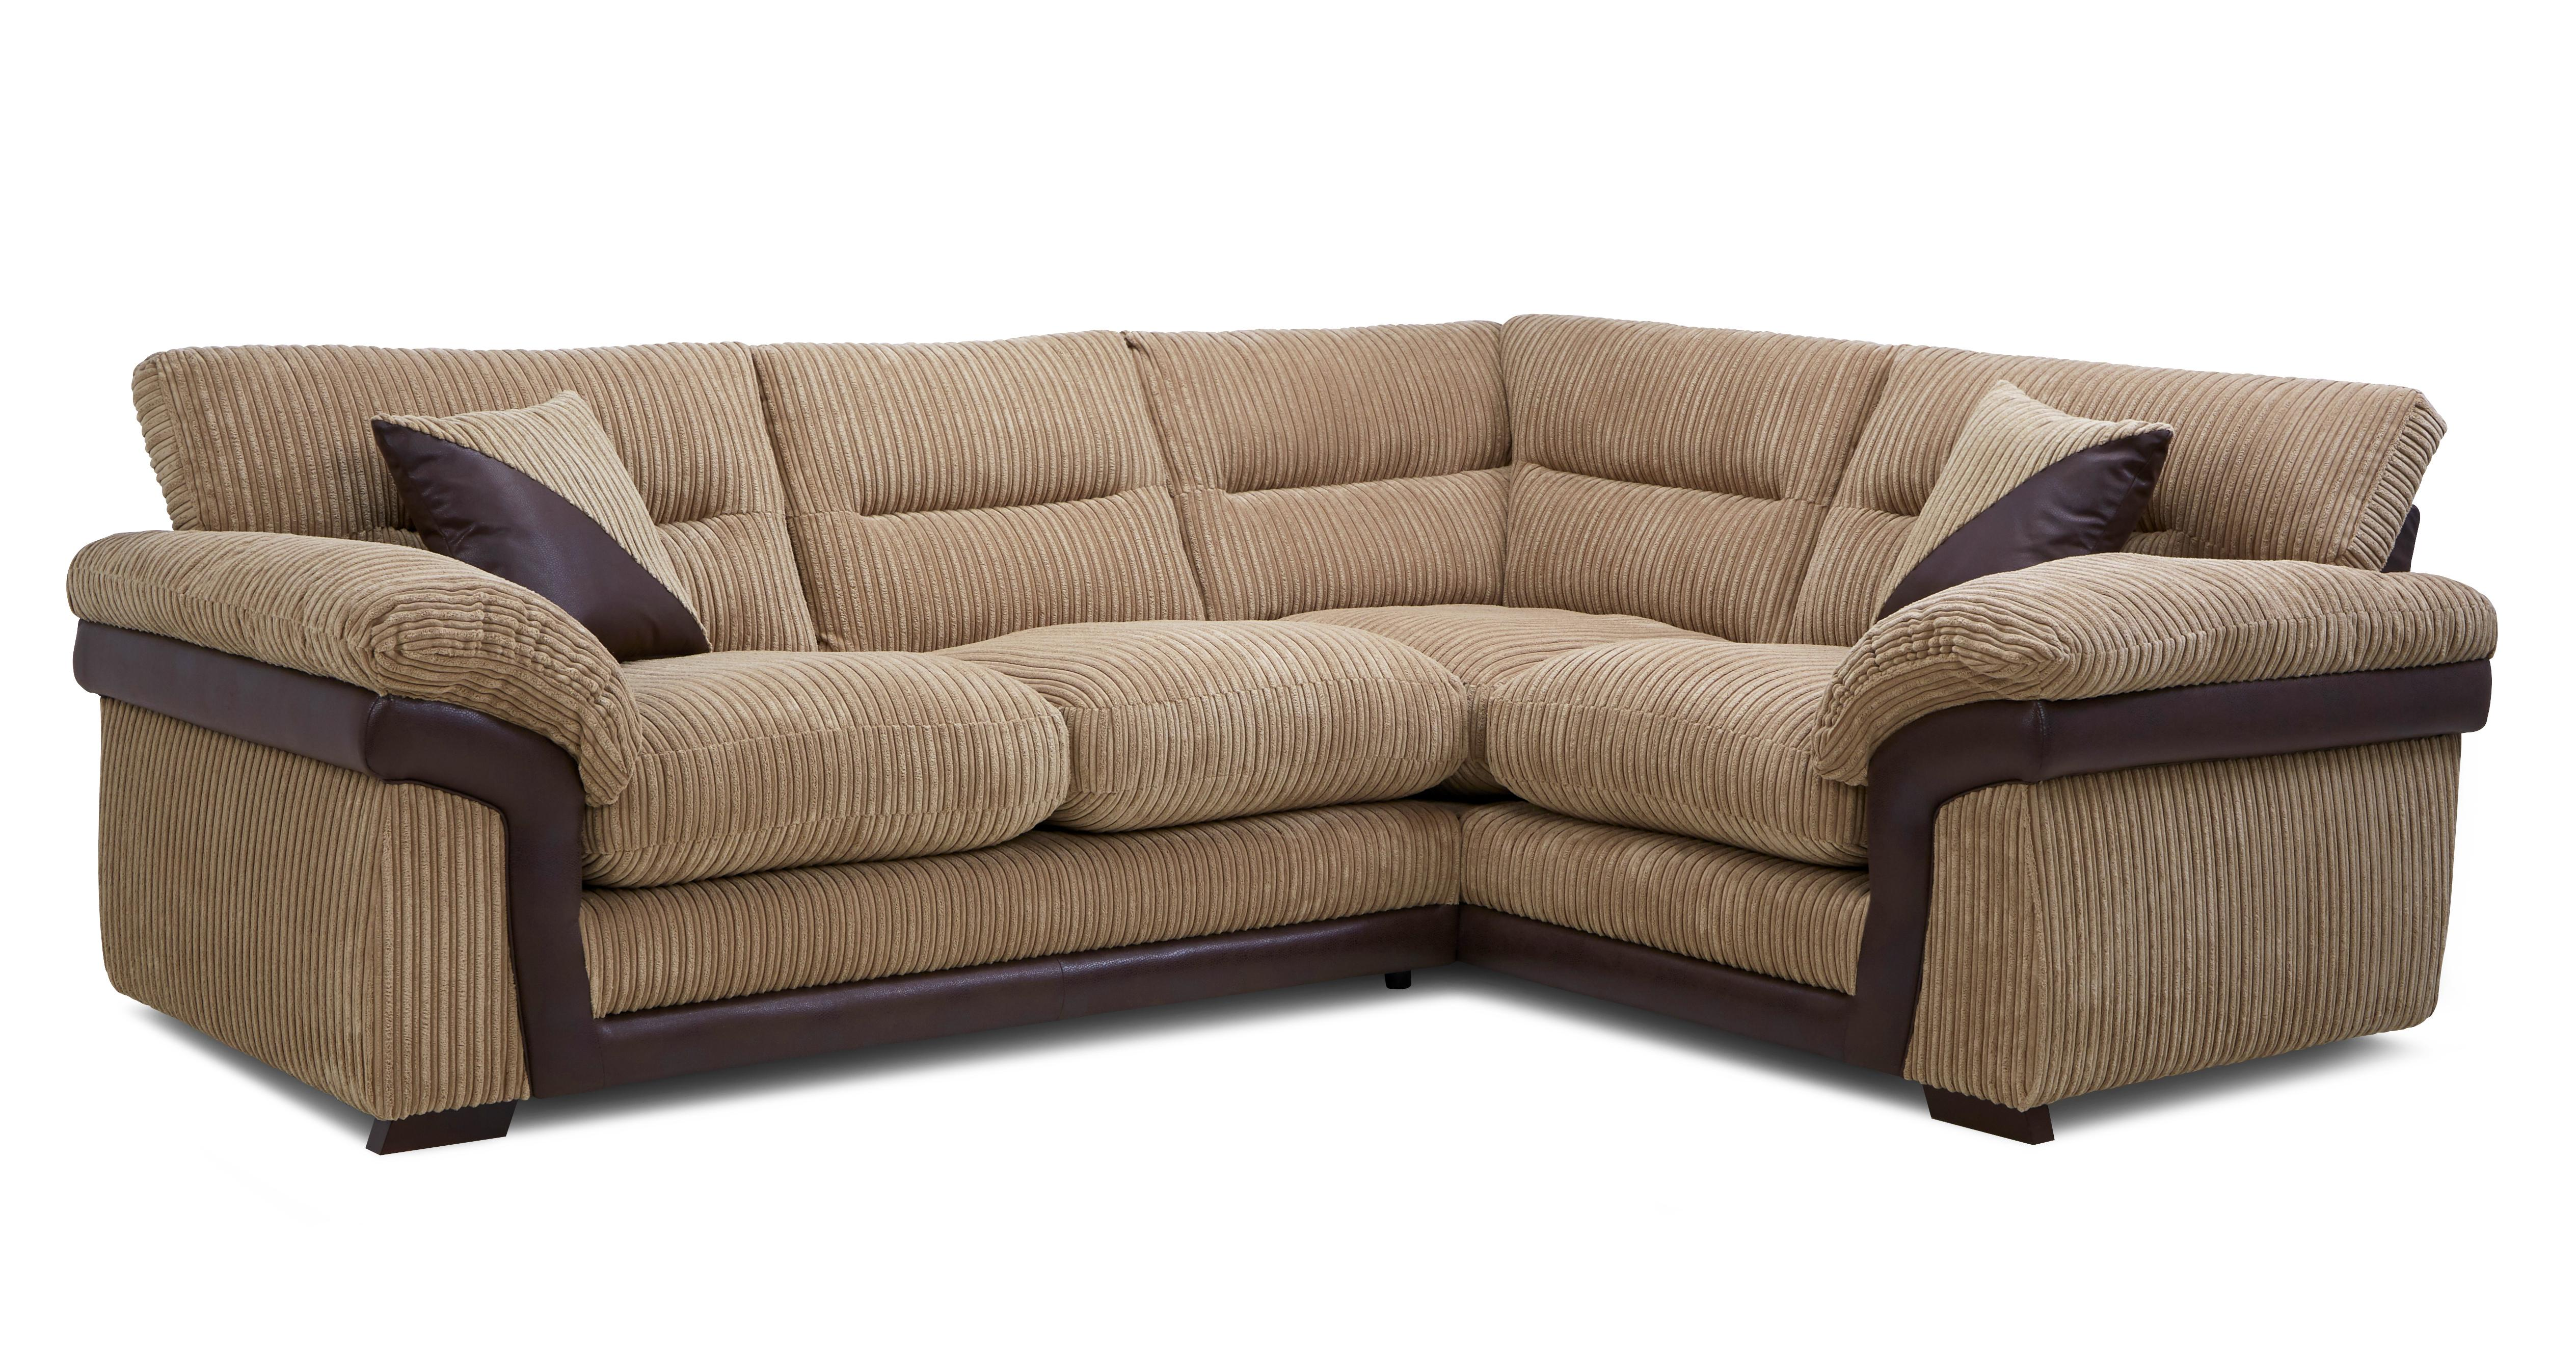 Ashdon Left Hand Facing Arm 2 Piece Corner Sofa Samson Dfs